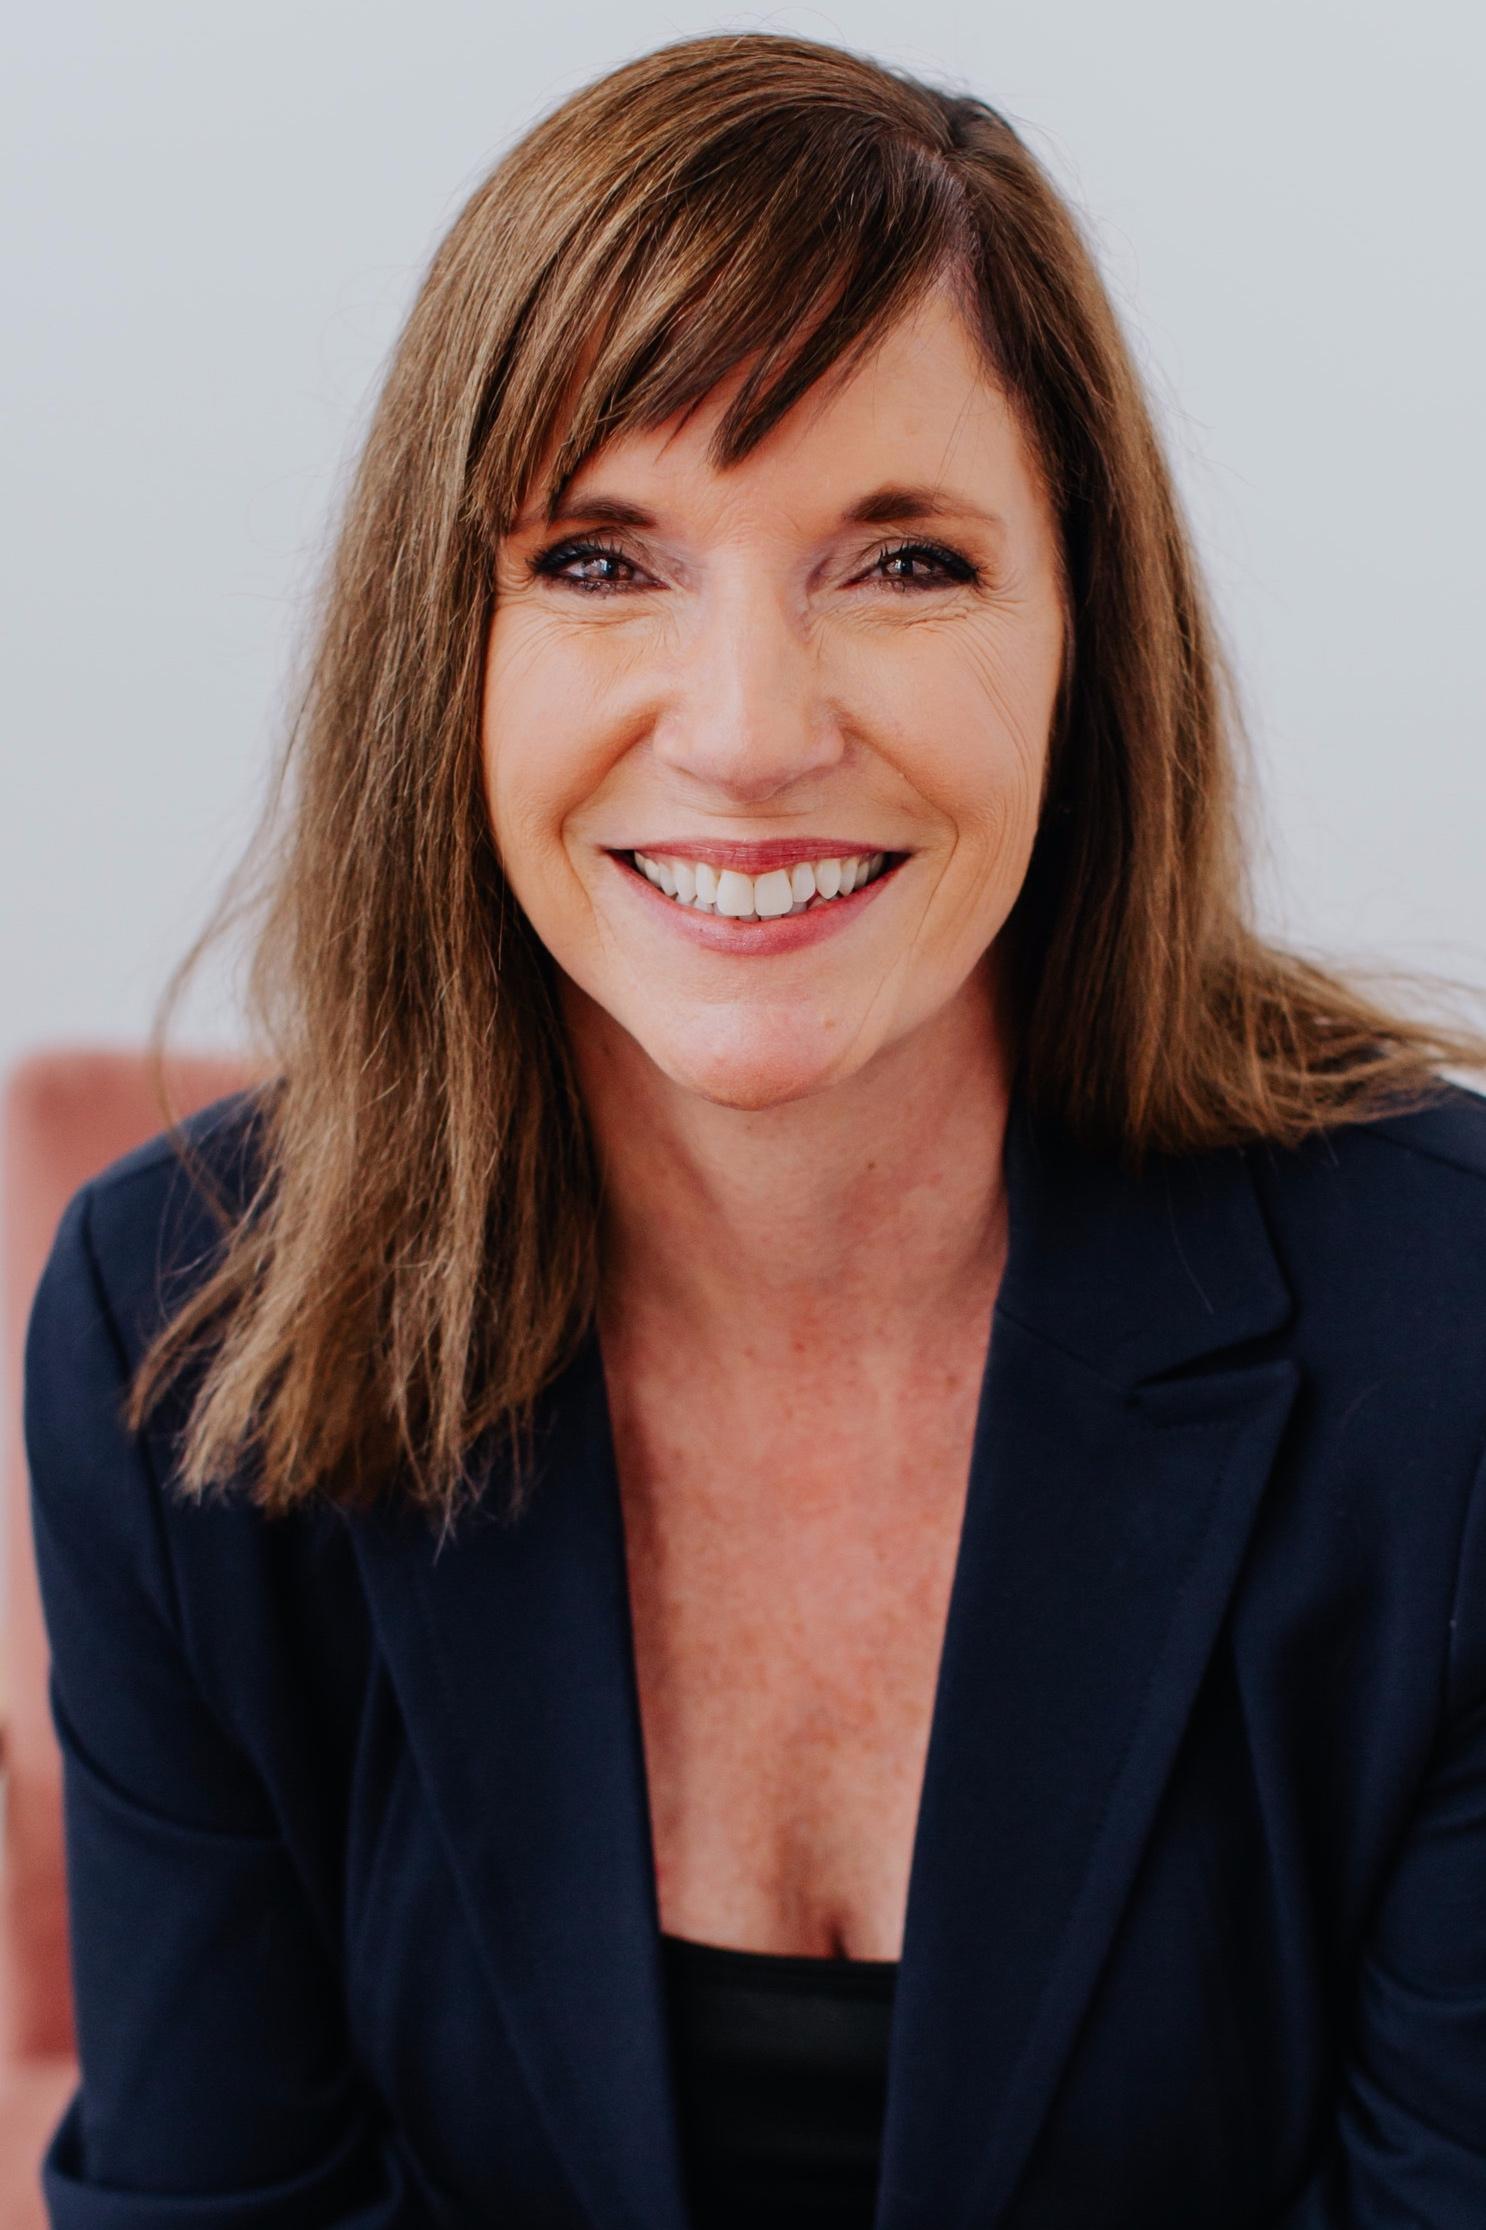 Laura Mattingly - Chief Information Officer/Senior Vice President, Altour